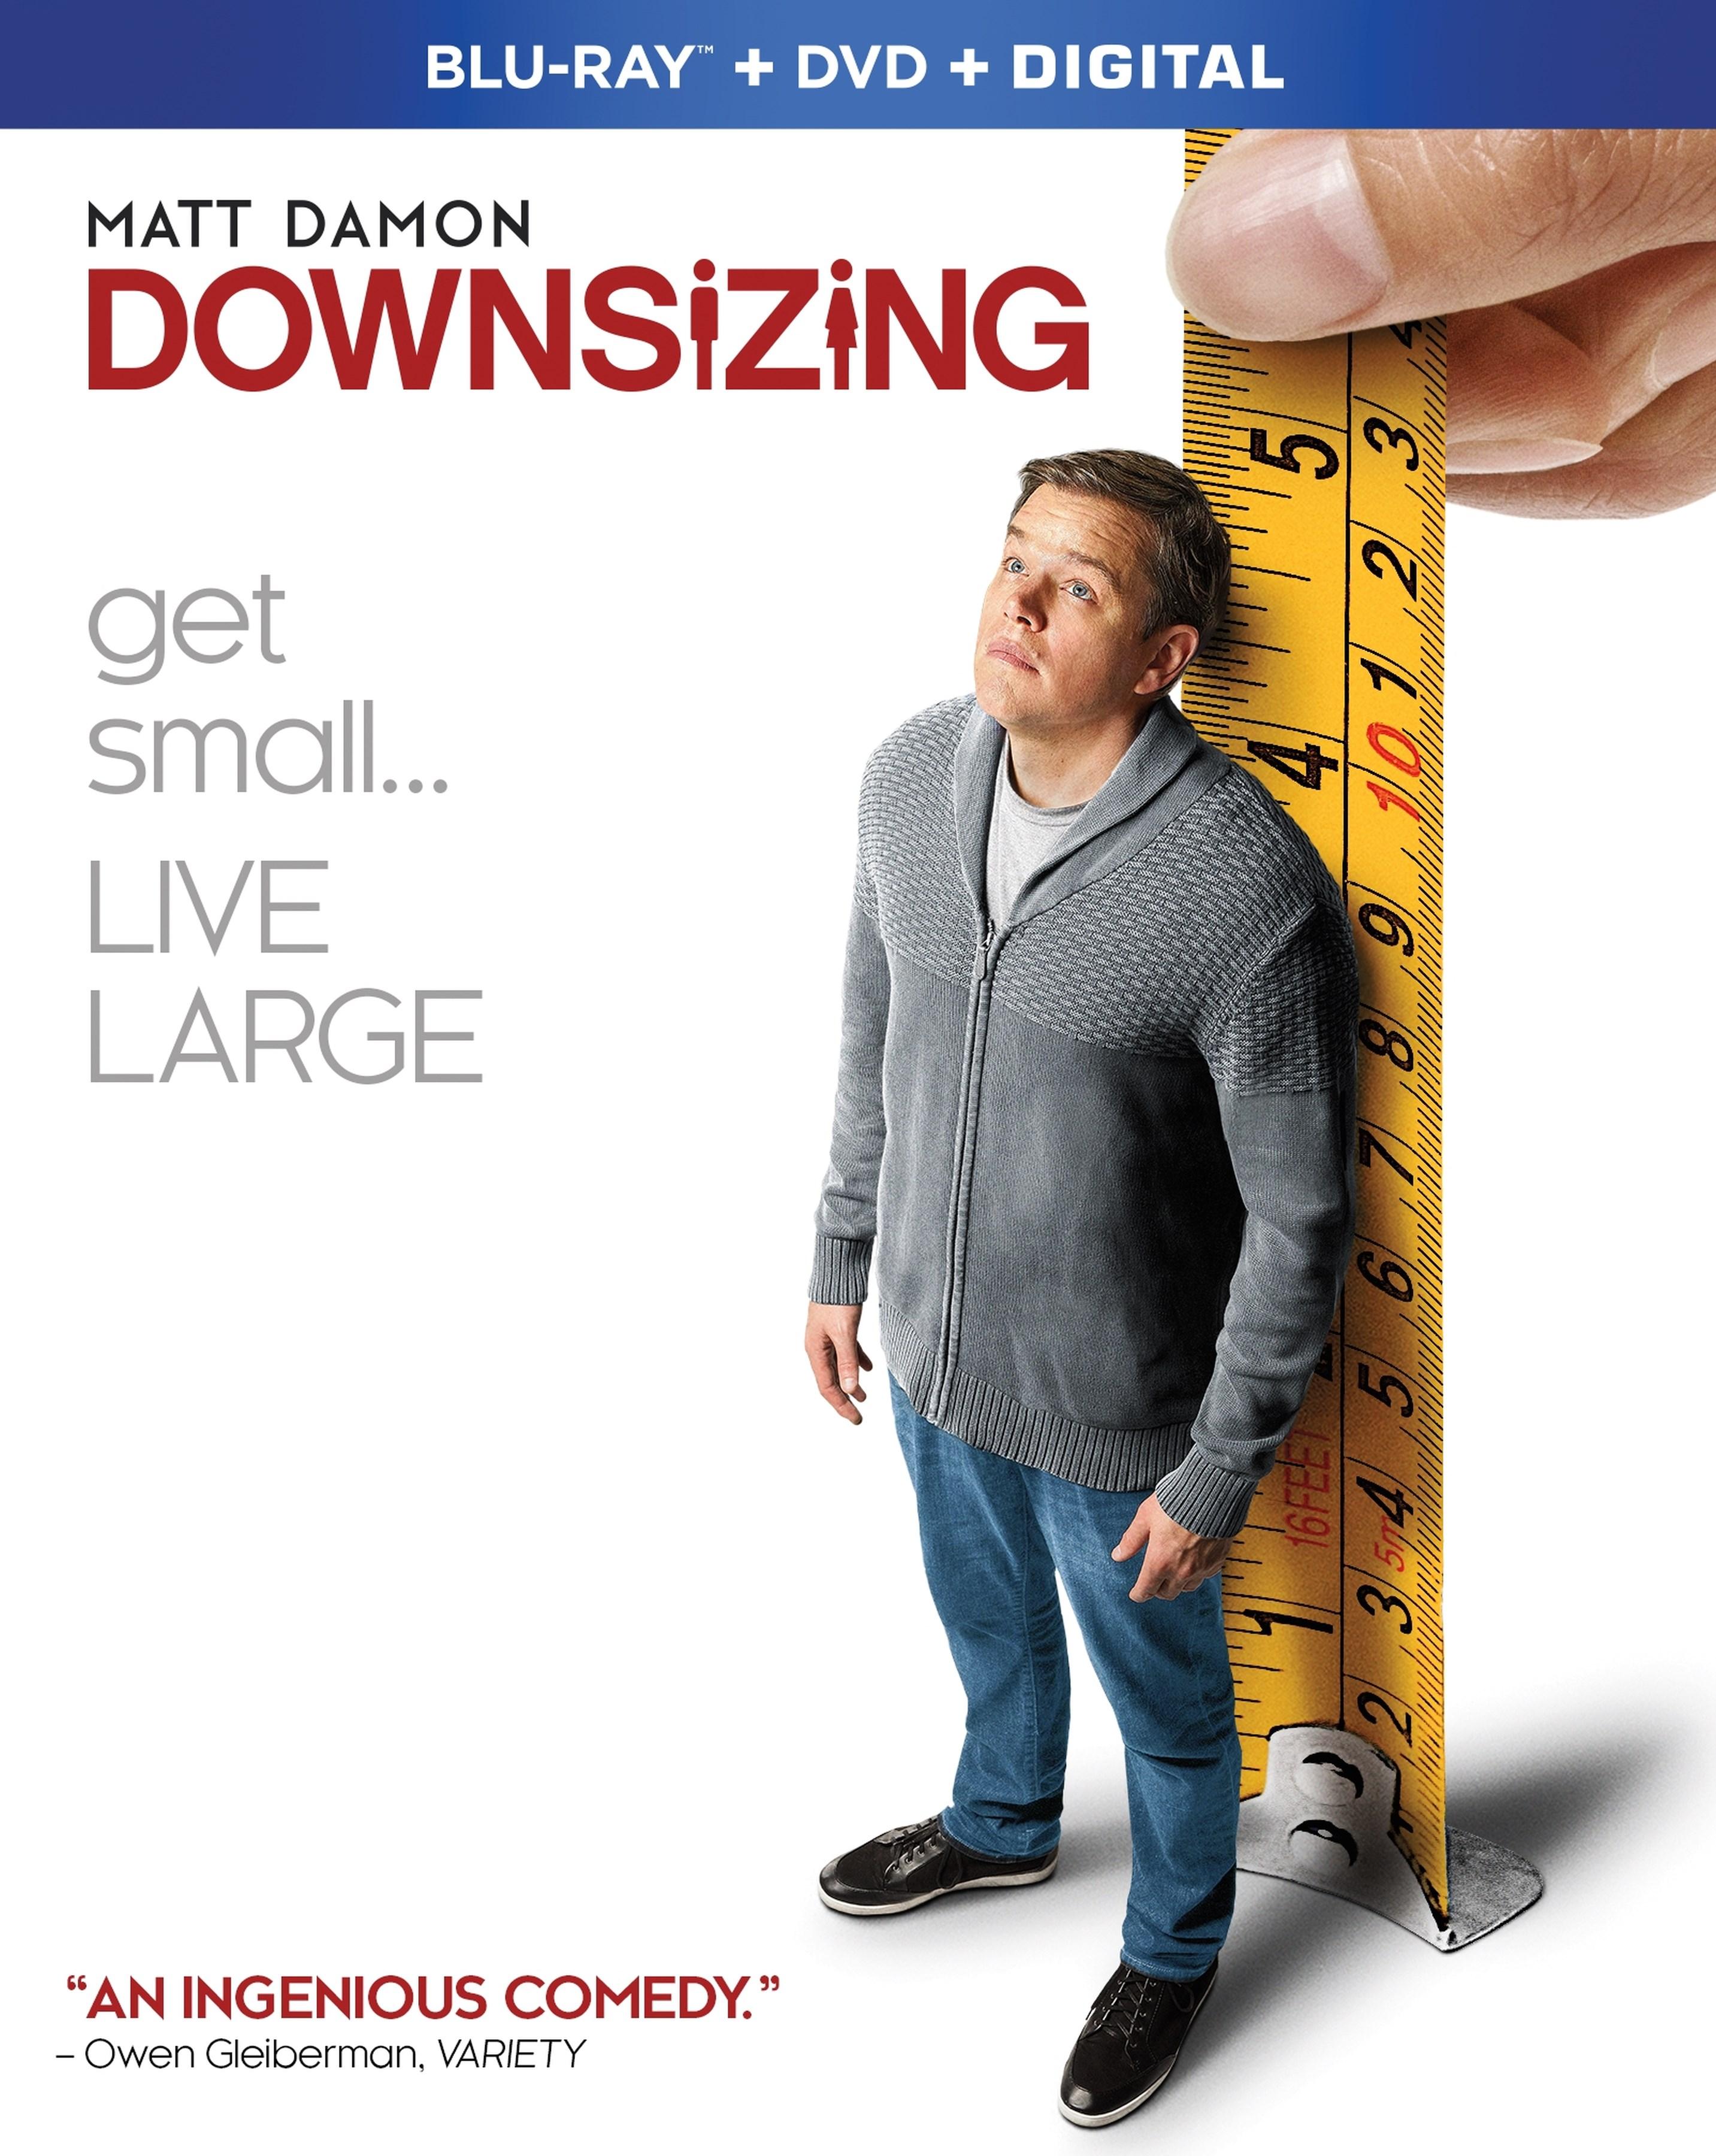 Downsizing (Blu-ray + DVD + Digital) by Universal Studios Home Entert.